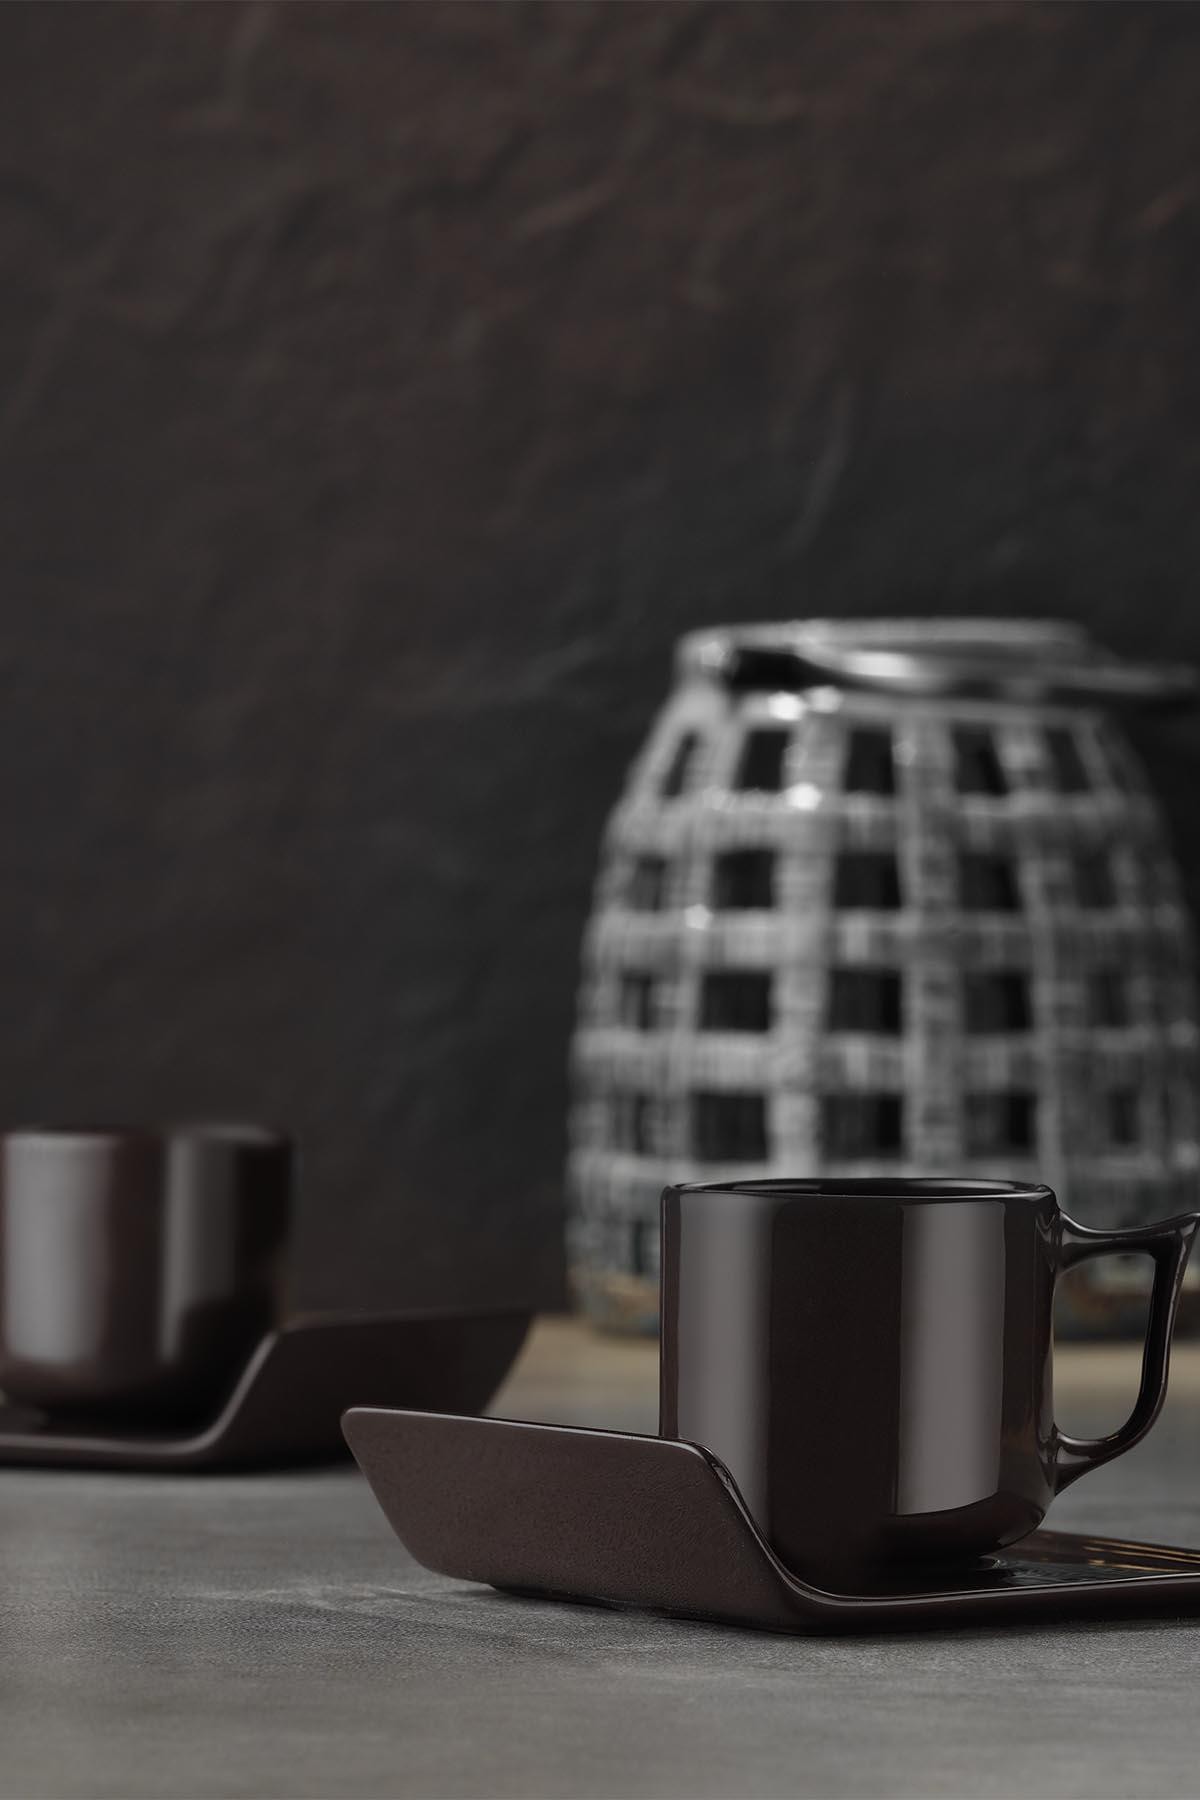 Kütahya Porselen Despina 4 Parça Kahve Takımı Siyah